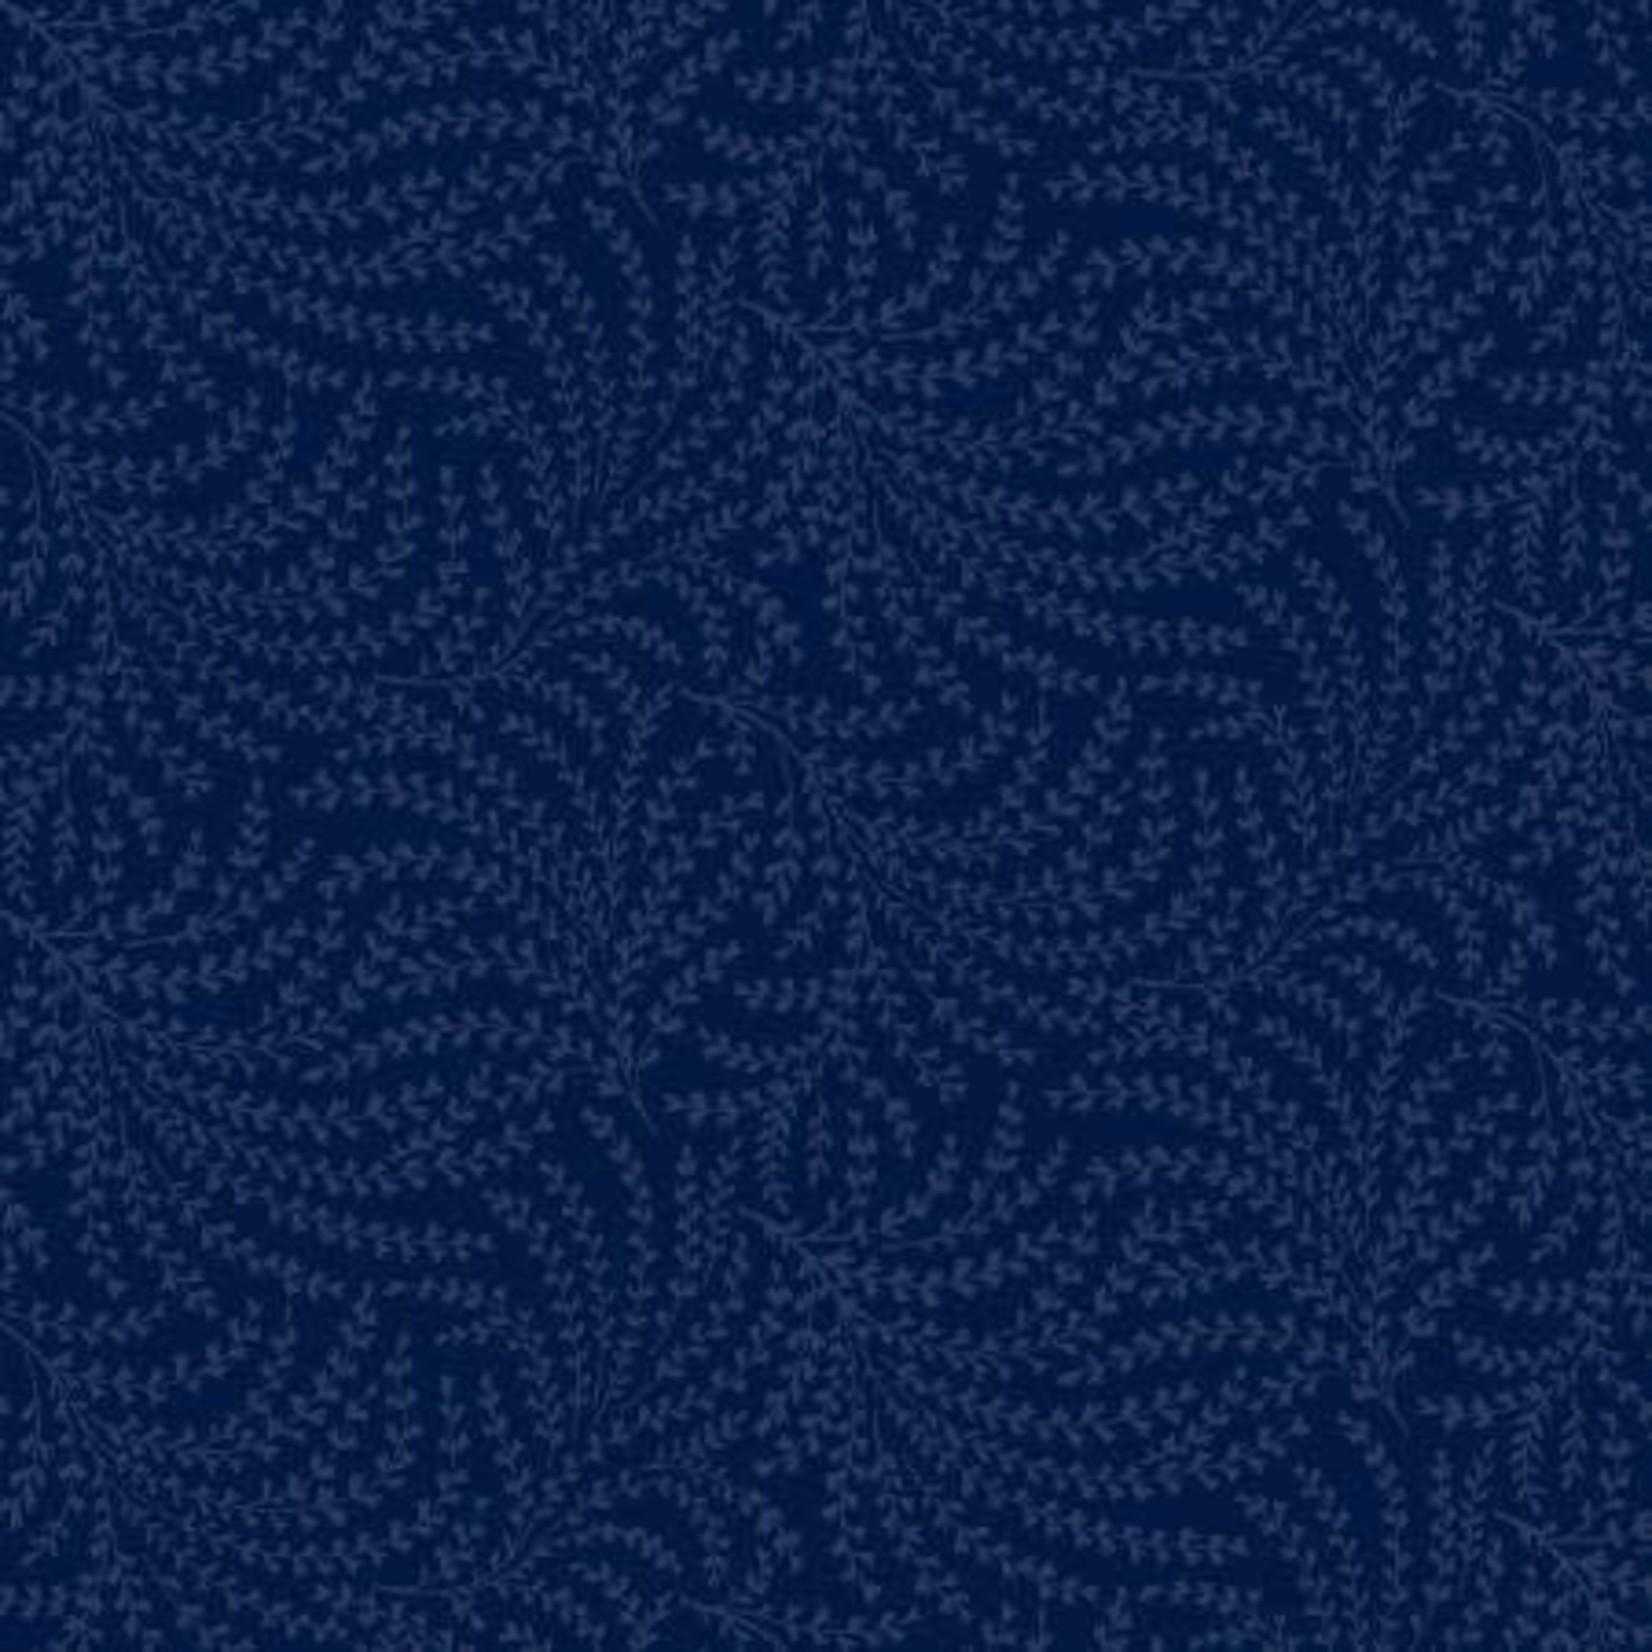 Windham Fabrics Fern - Blauw